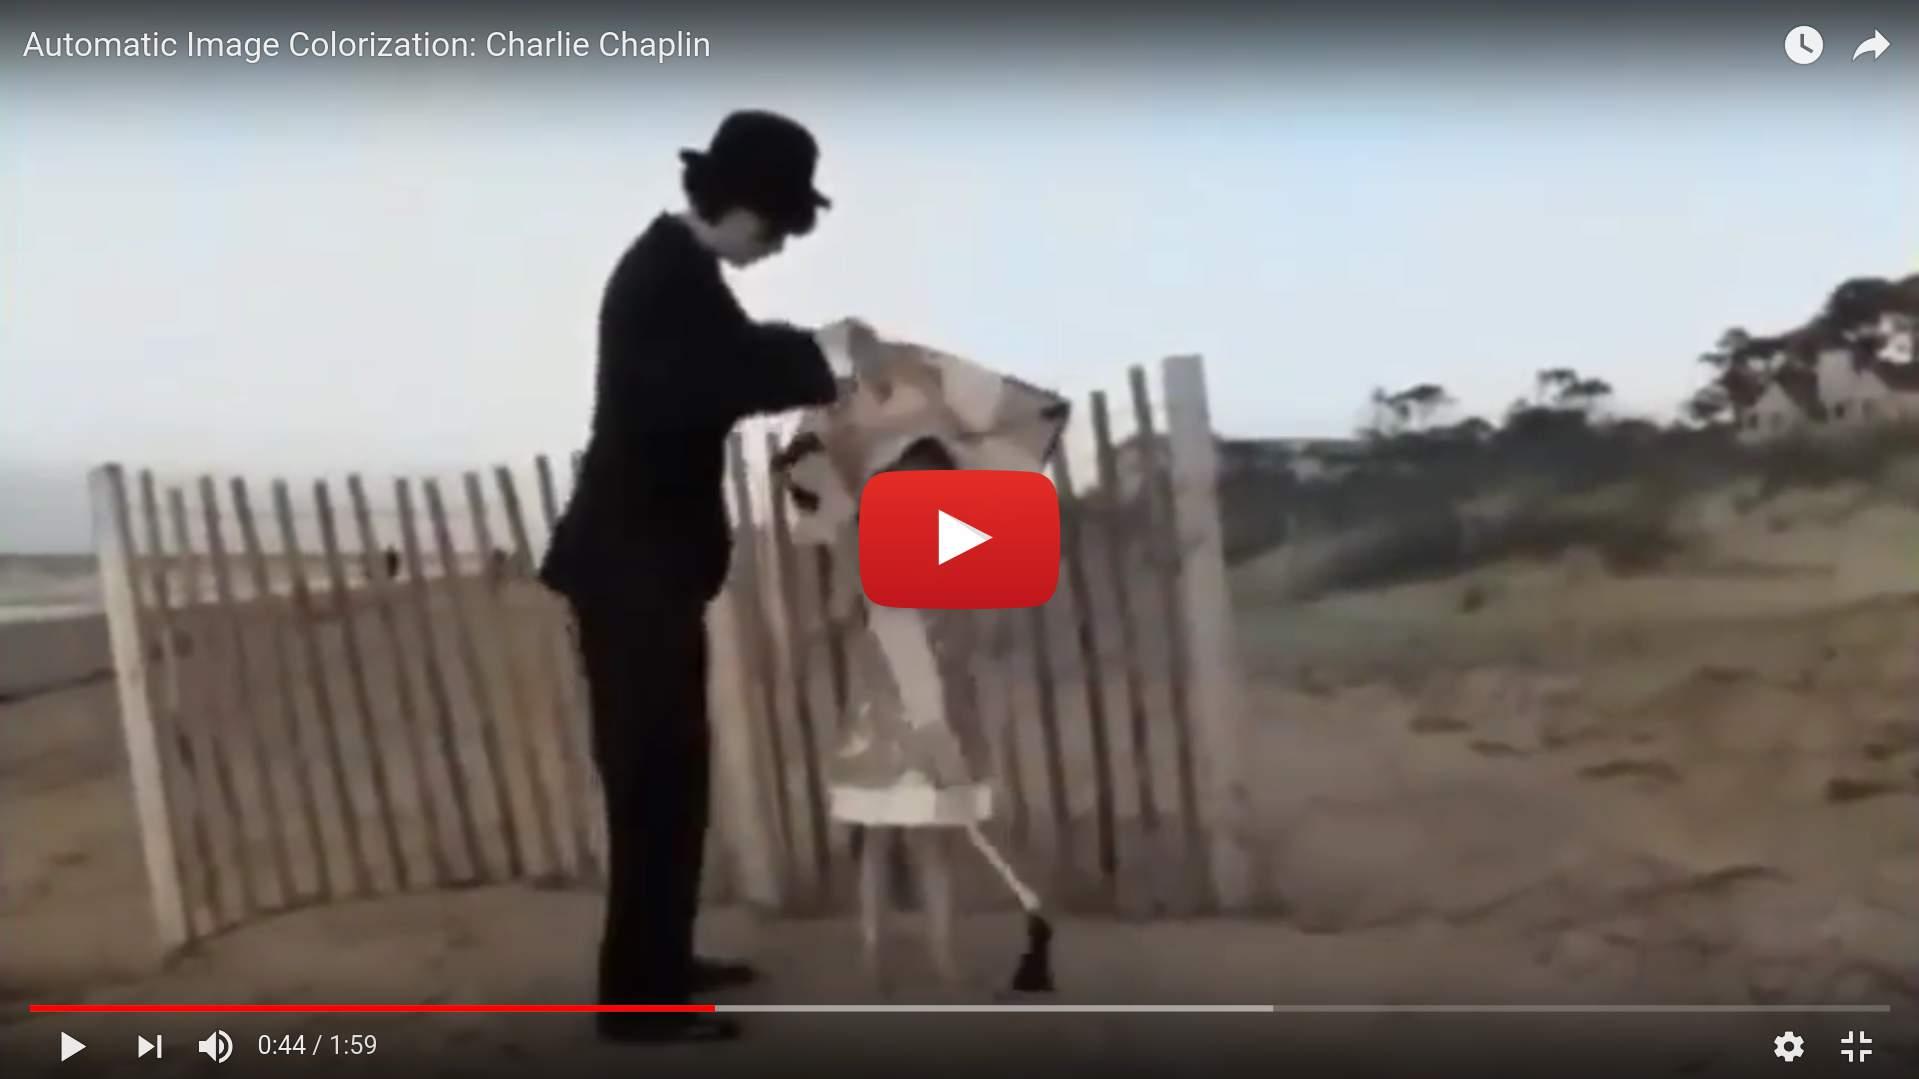 Colorizing Charlie Chaplin